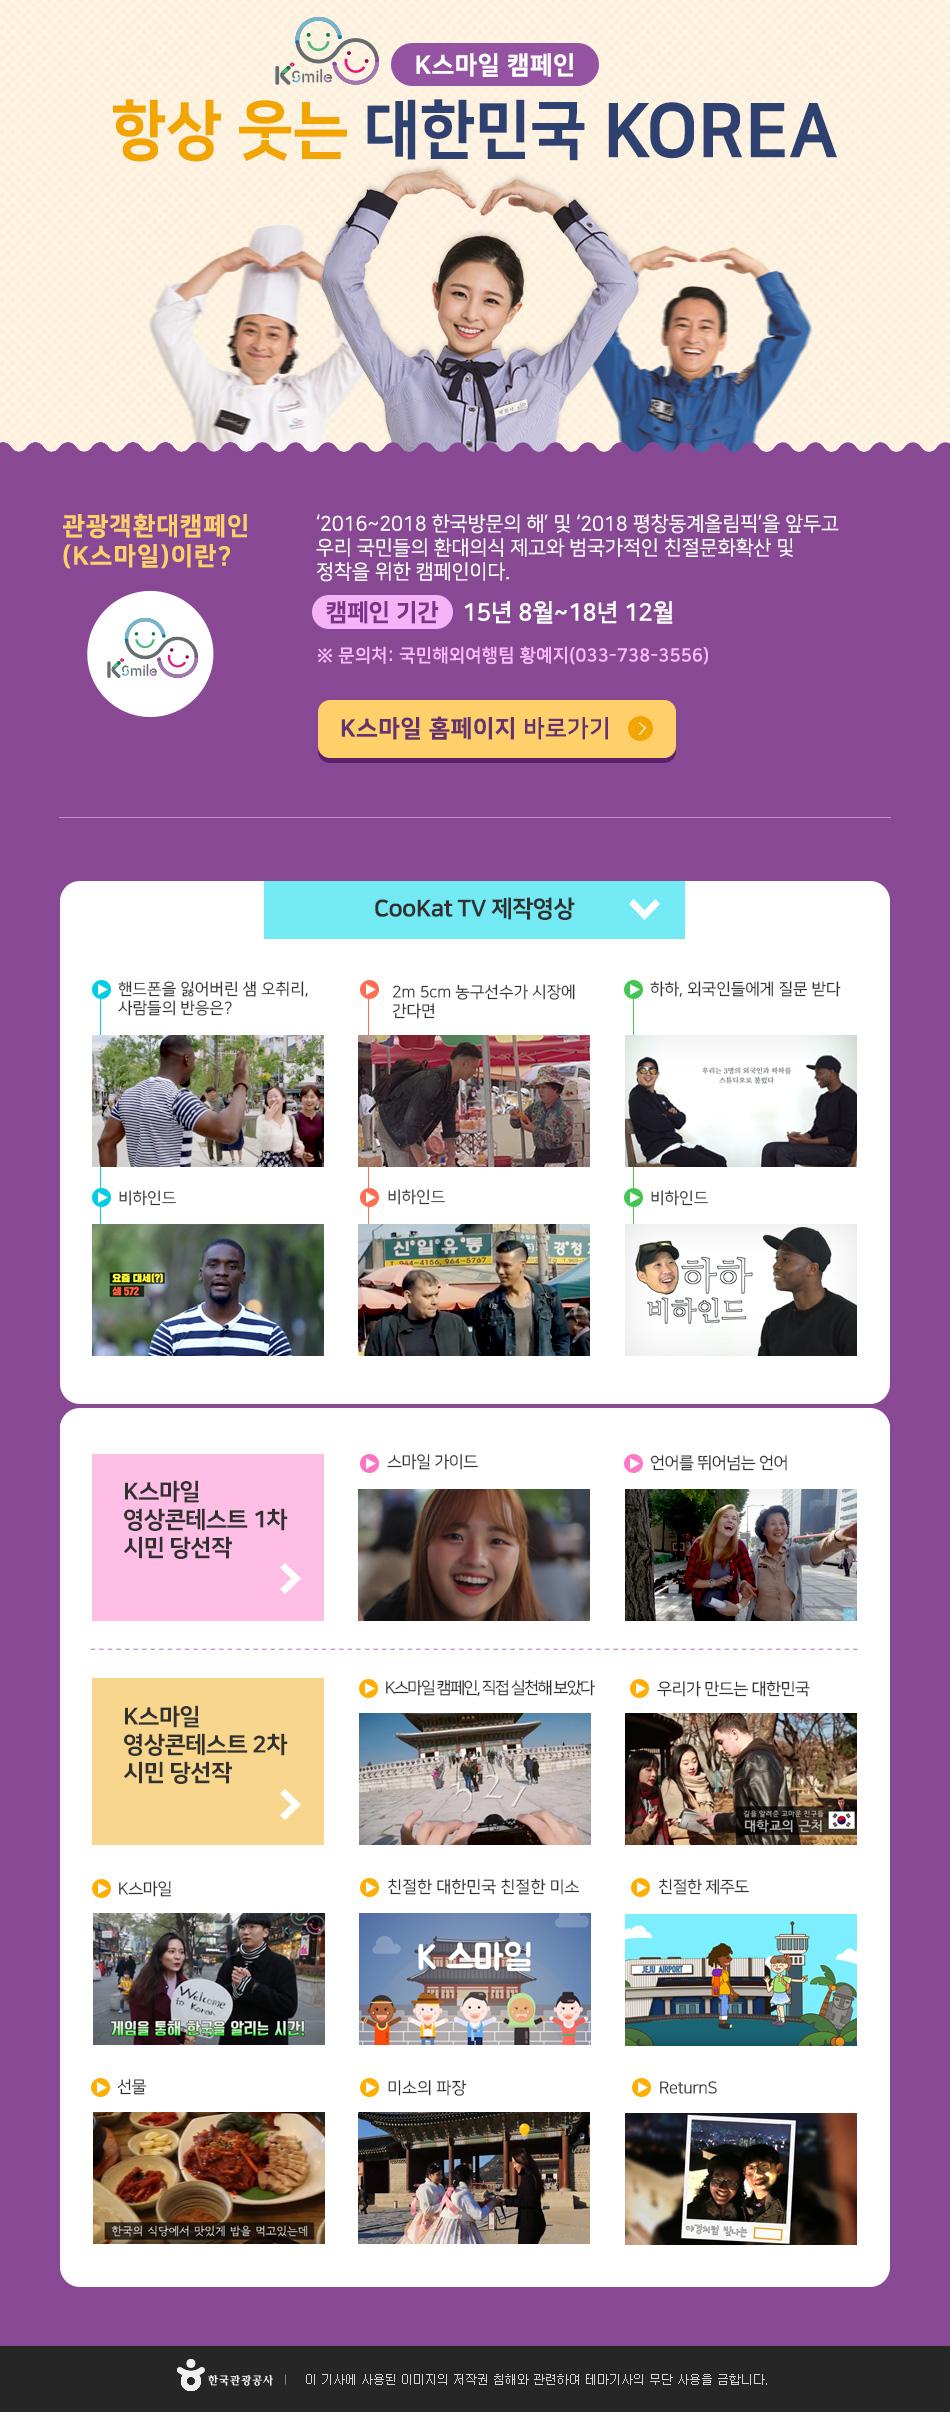 K스마일, K스마일 캠페인 항상 웃는 대한민국 KOREA